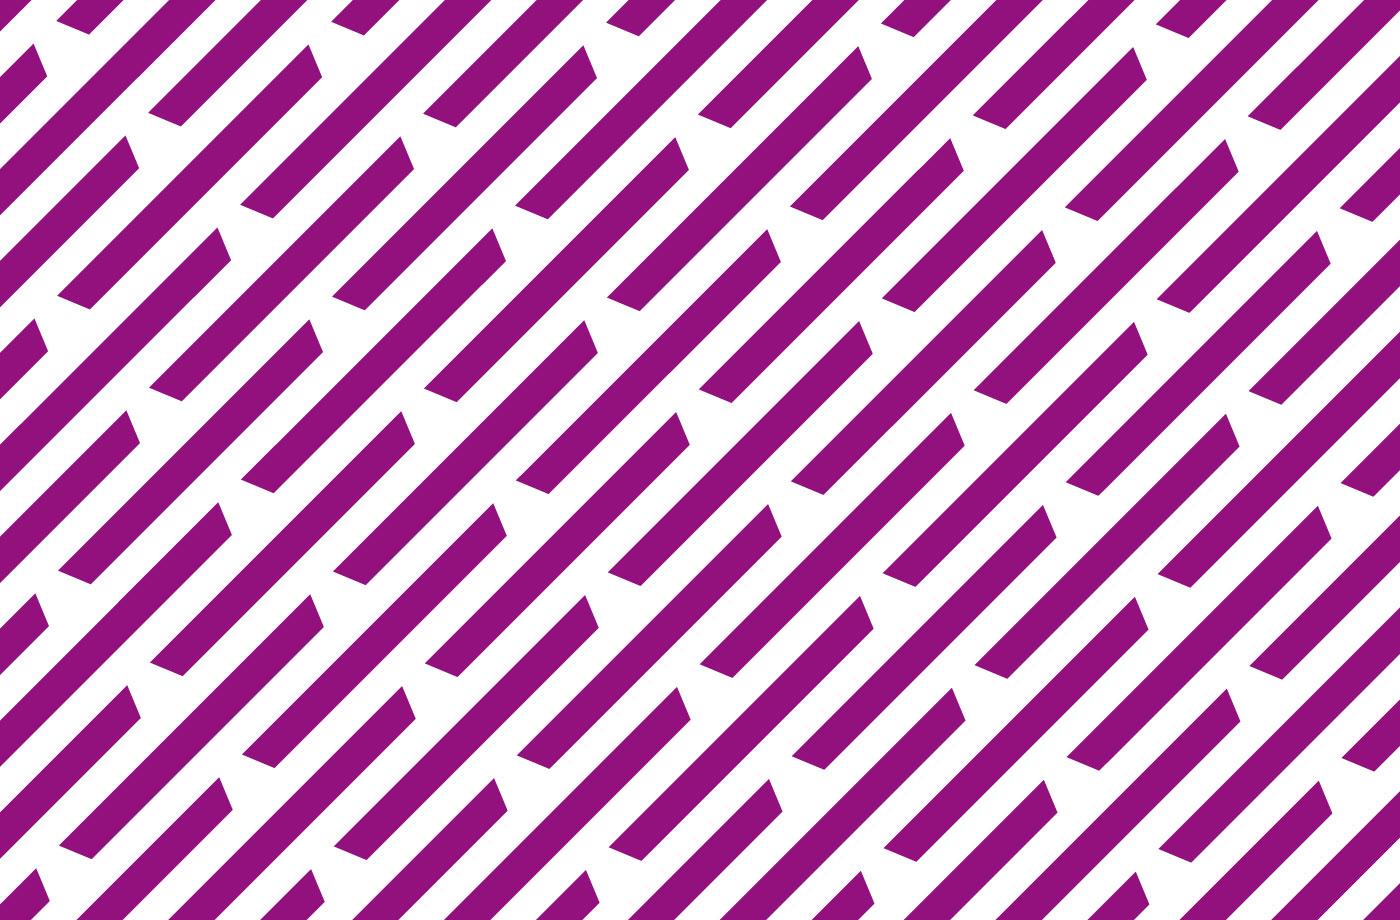 design of a brand pattern